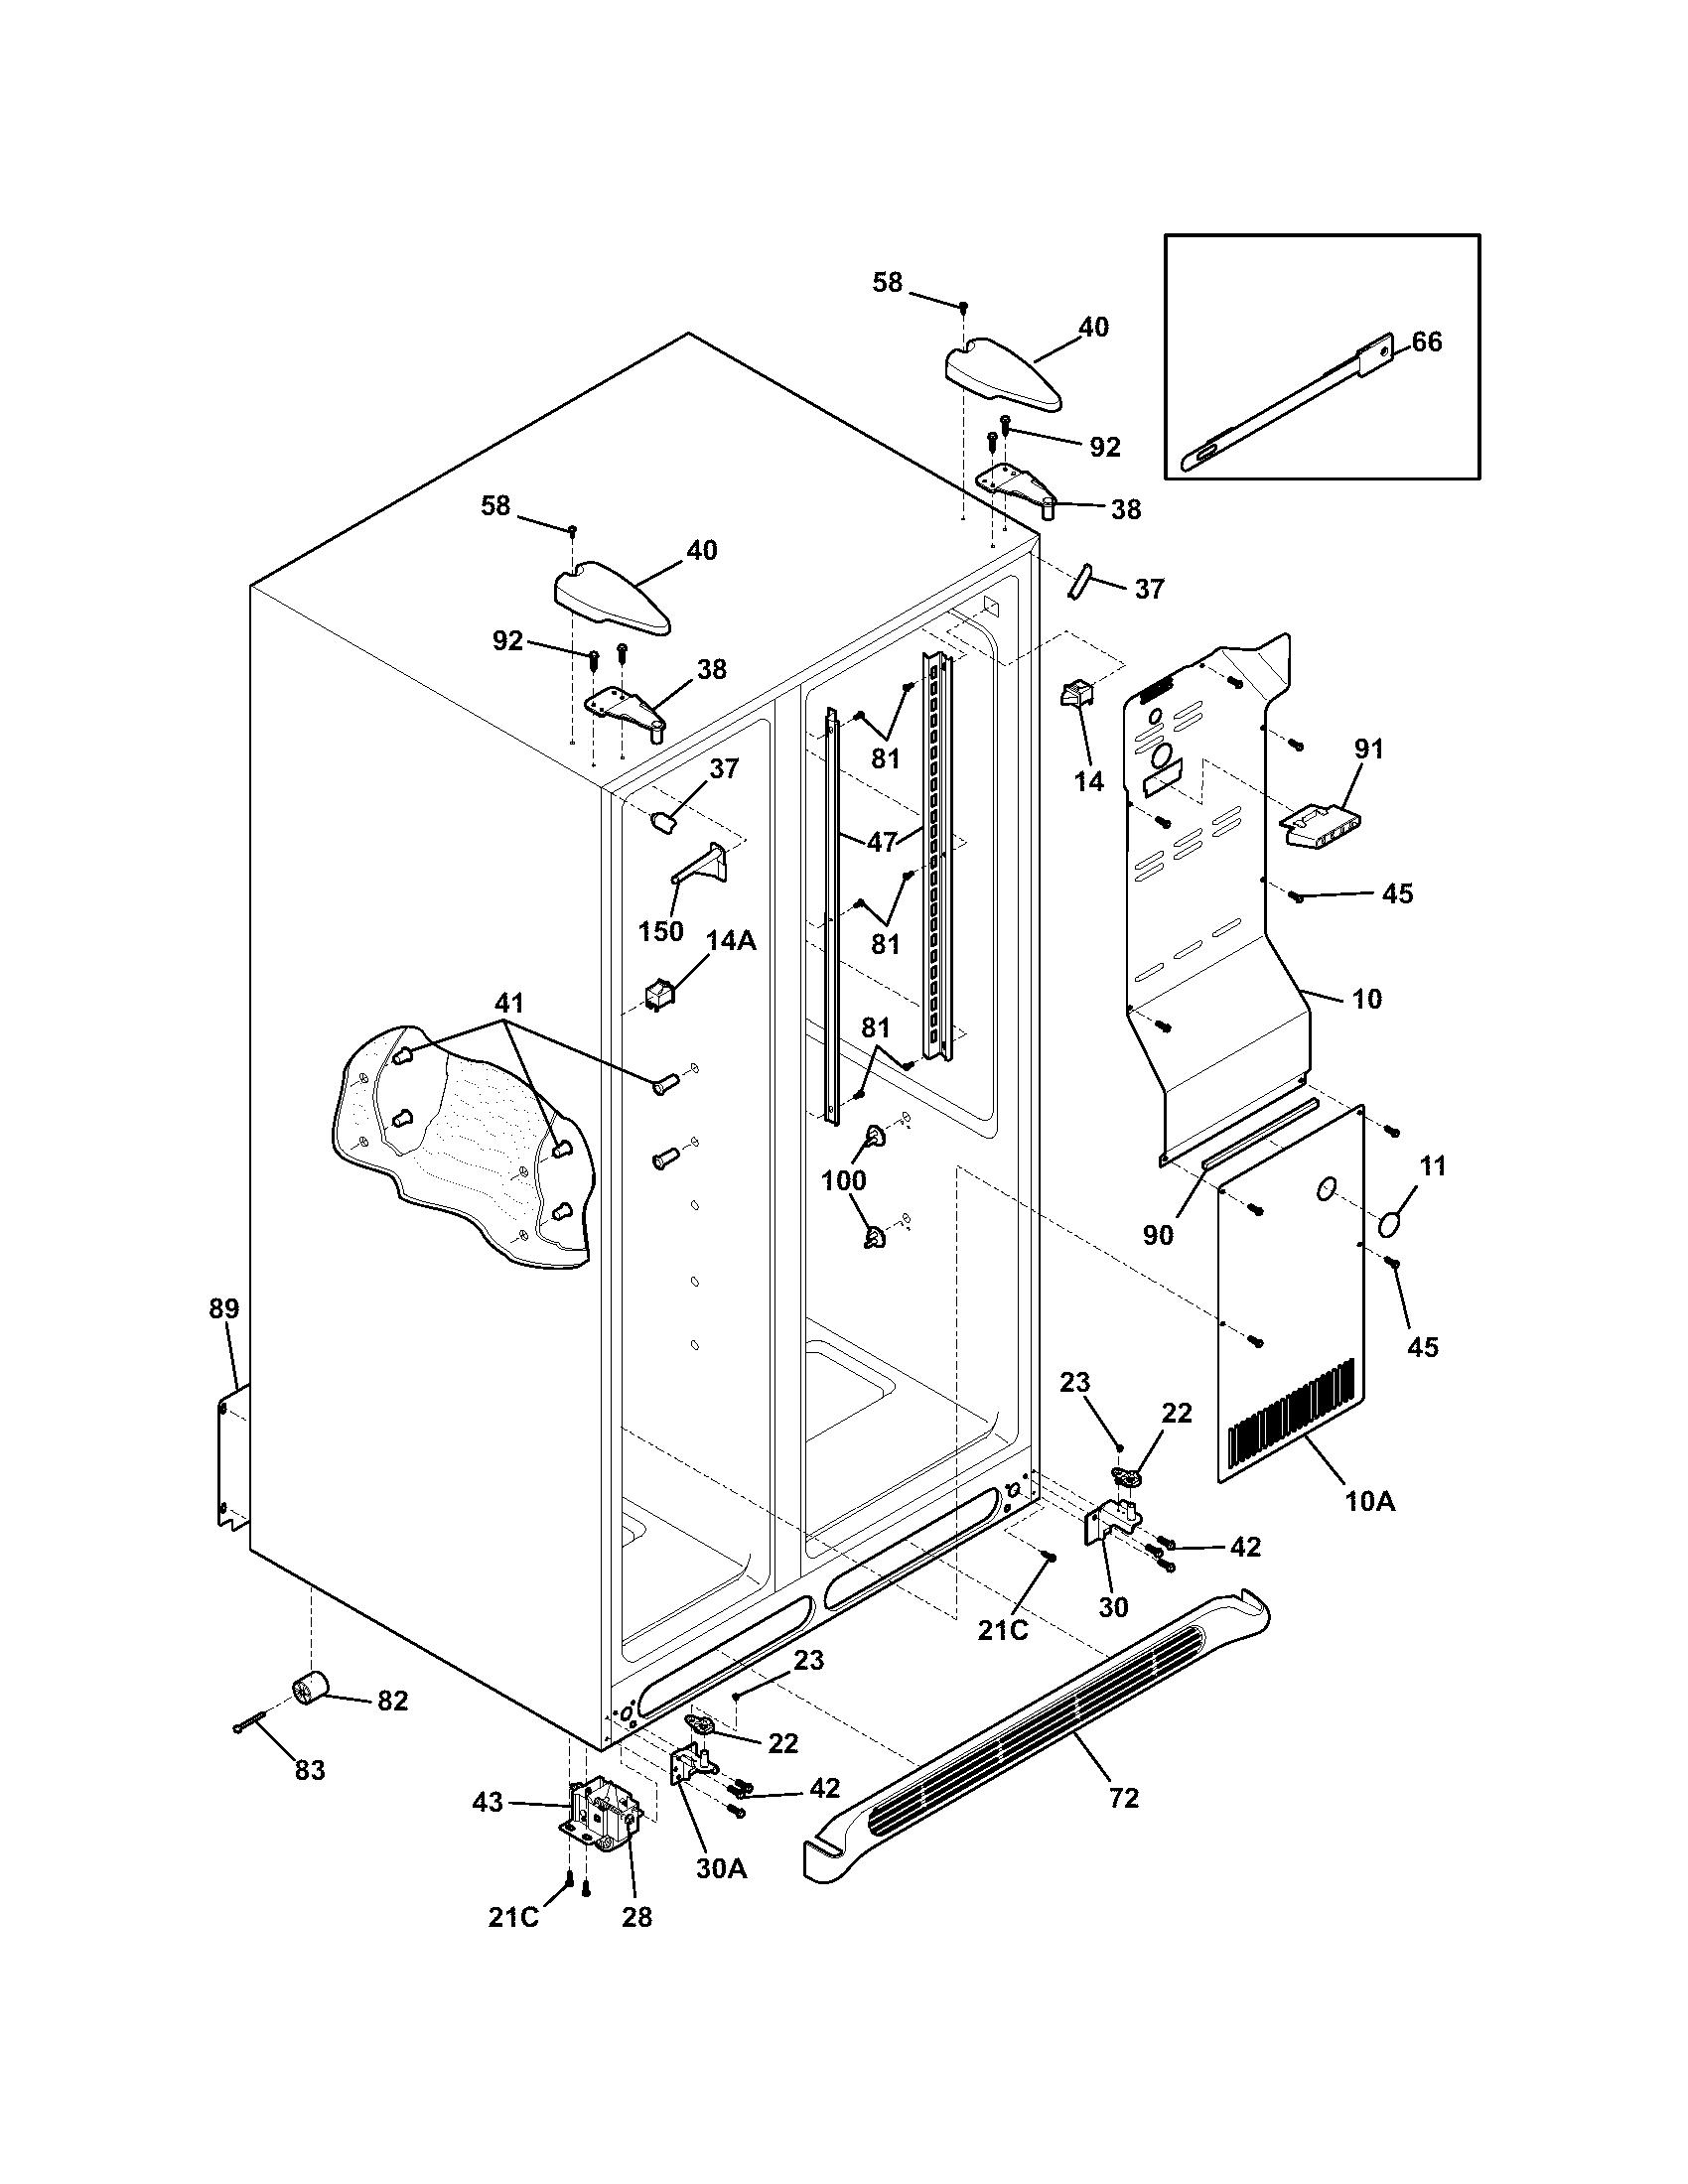 Frigidaire Refrigerator: January 2016